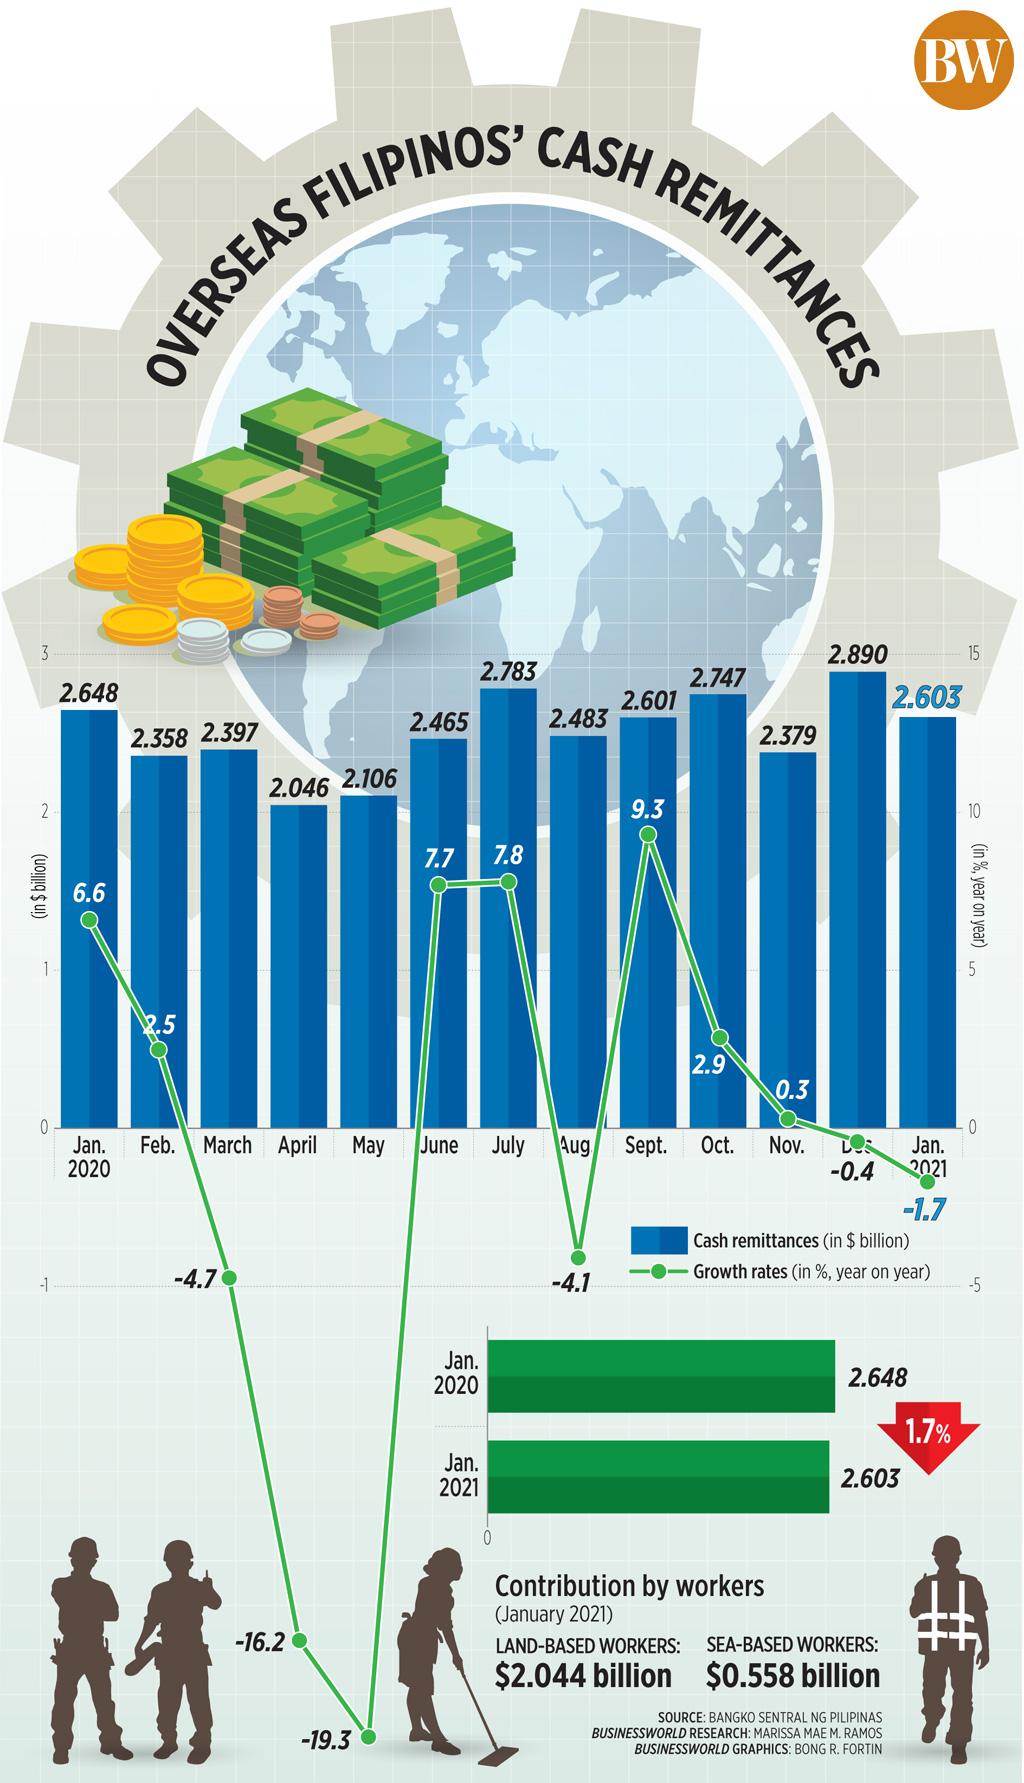 Overseas Filipinos' cash remittances (Jan. 2021)